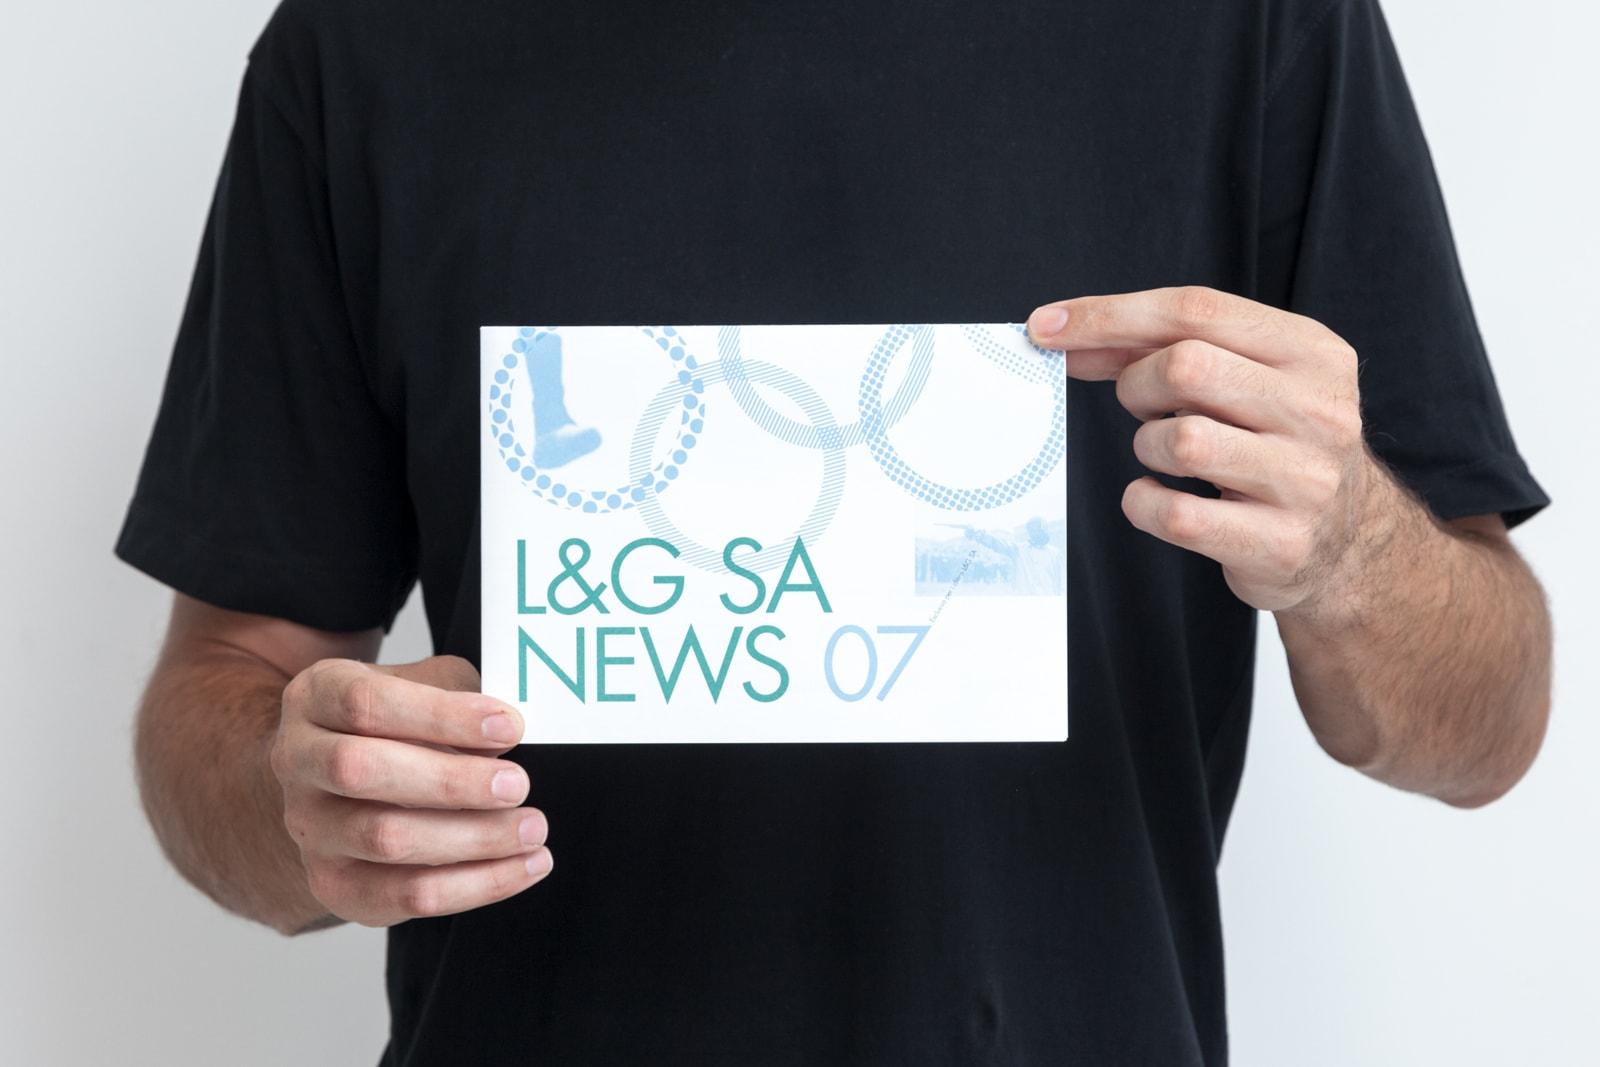 L&G News 07